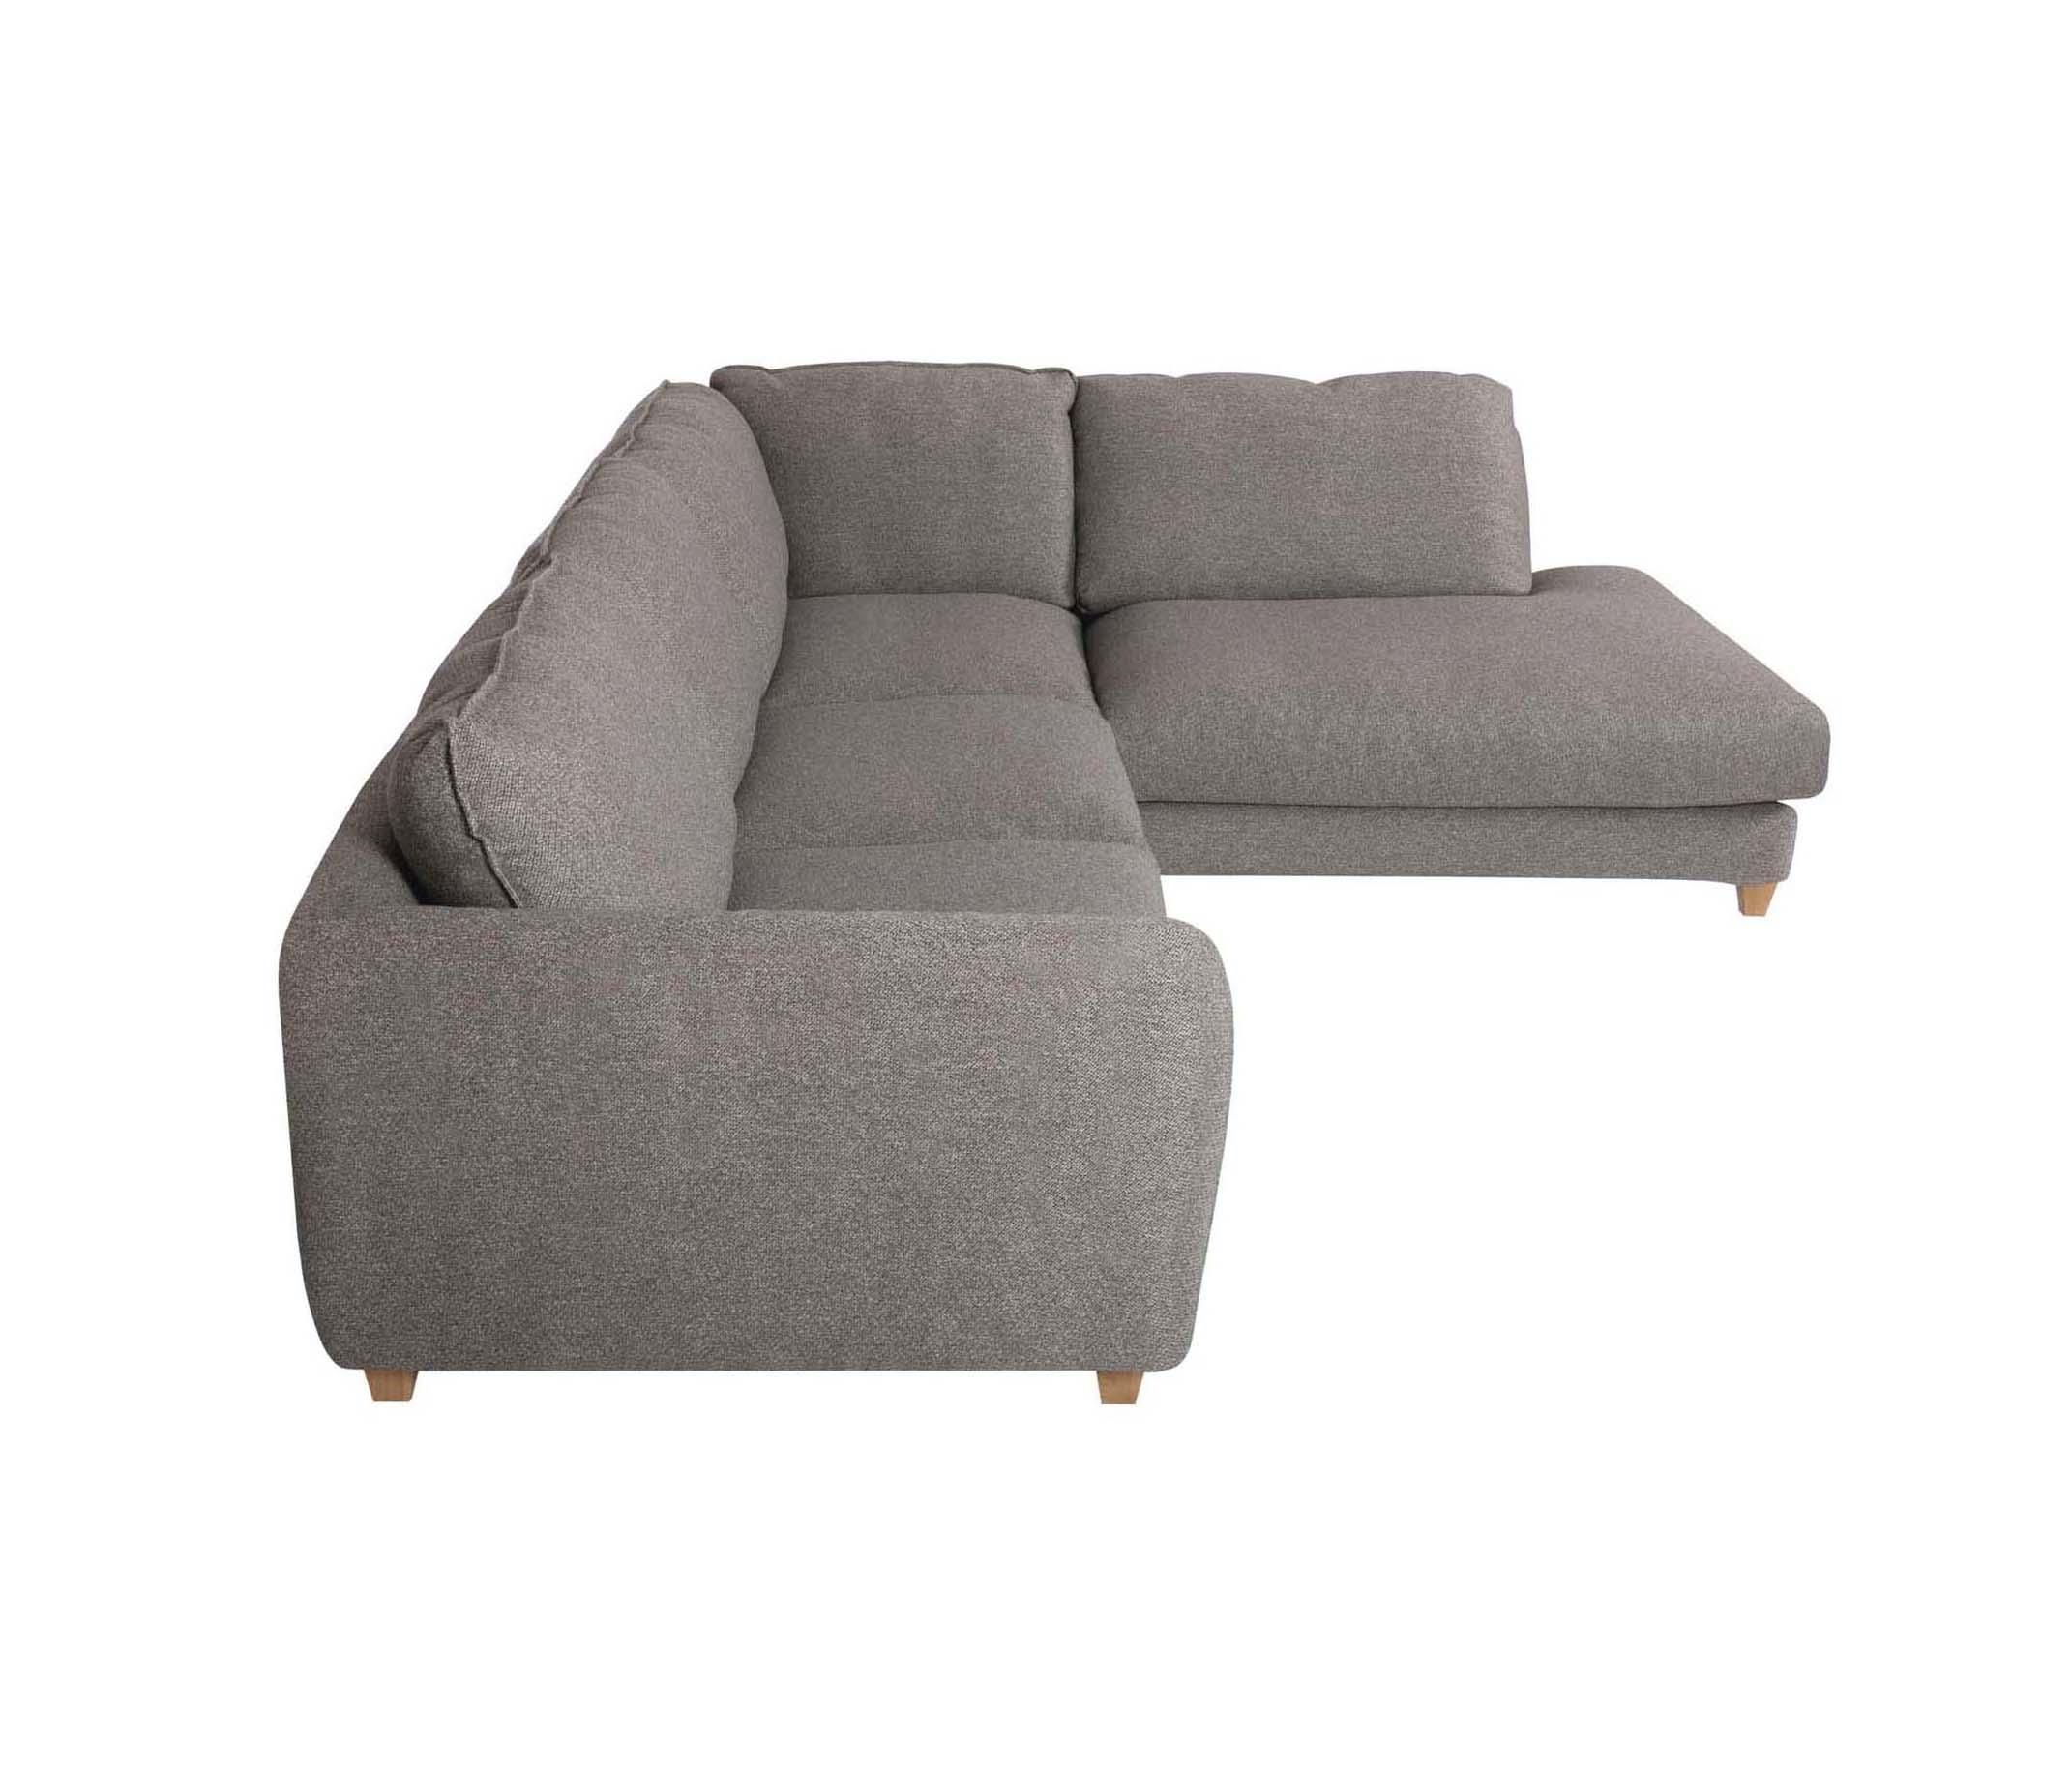 viktoria sofas von sits architonic. Black Bedroom Furniture Sets. Home Design Ideas